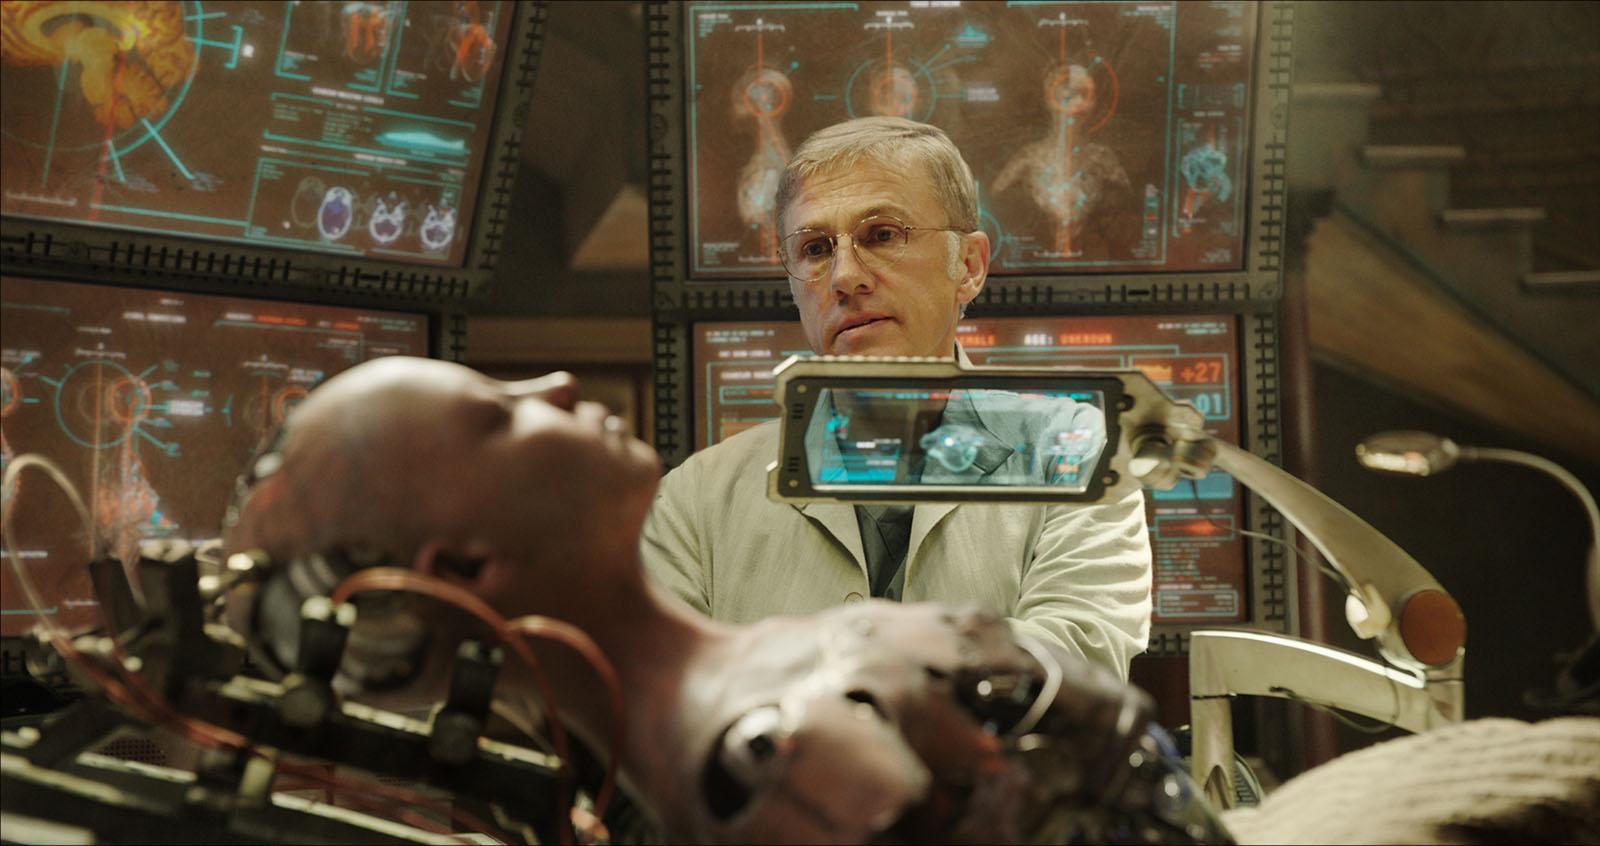 Dr Dyson Ido (Christoph Waltz) brings Alita to life in Alita: Battle Angel (2019)